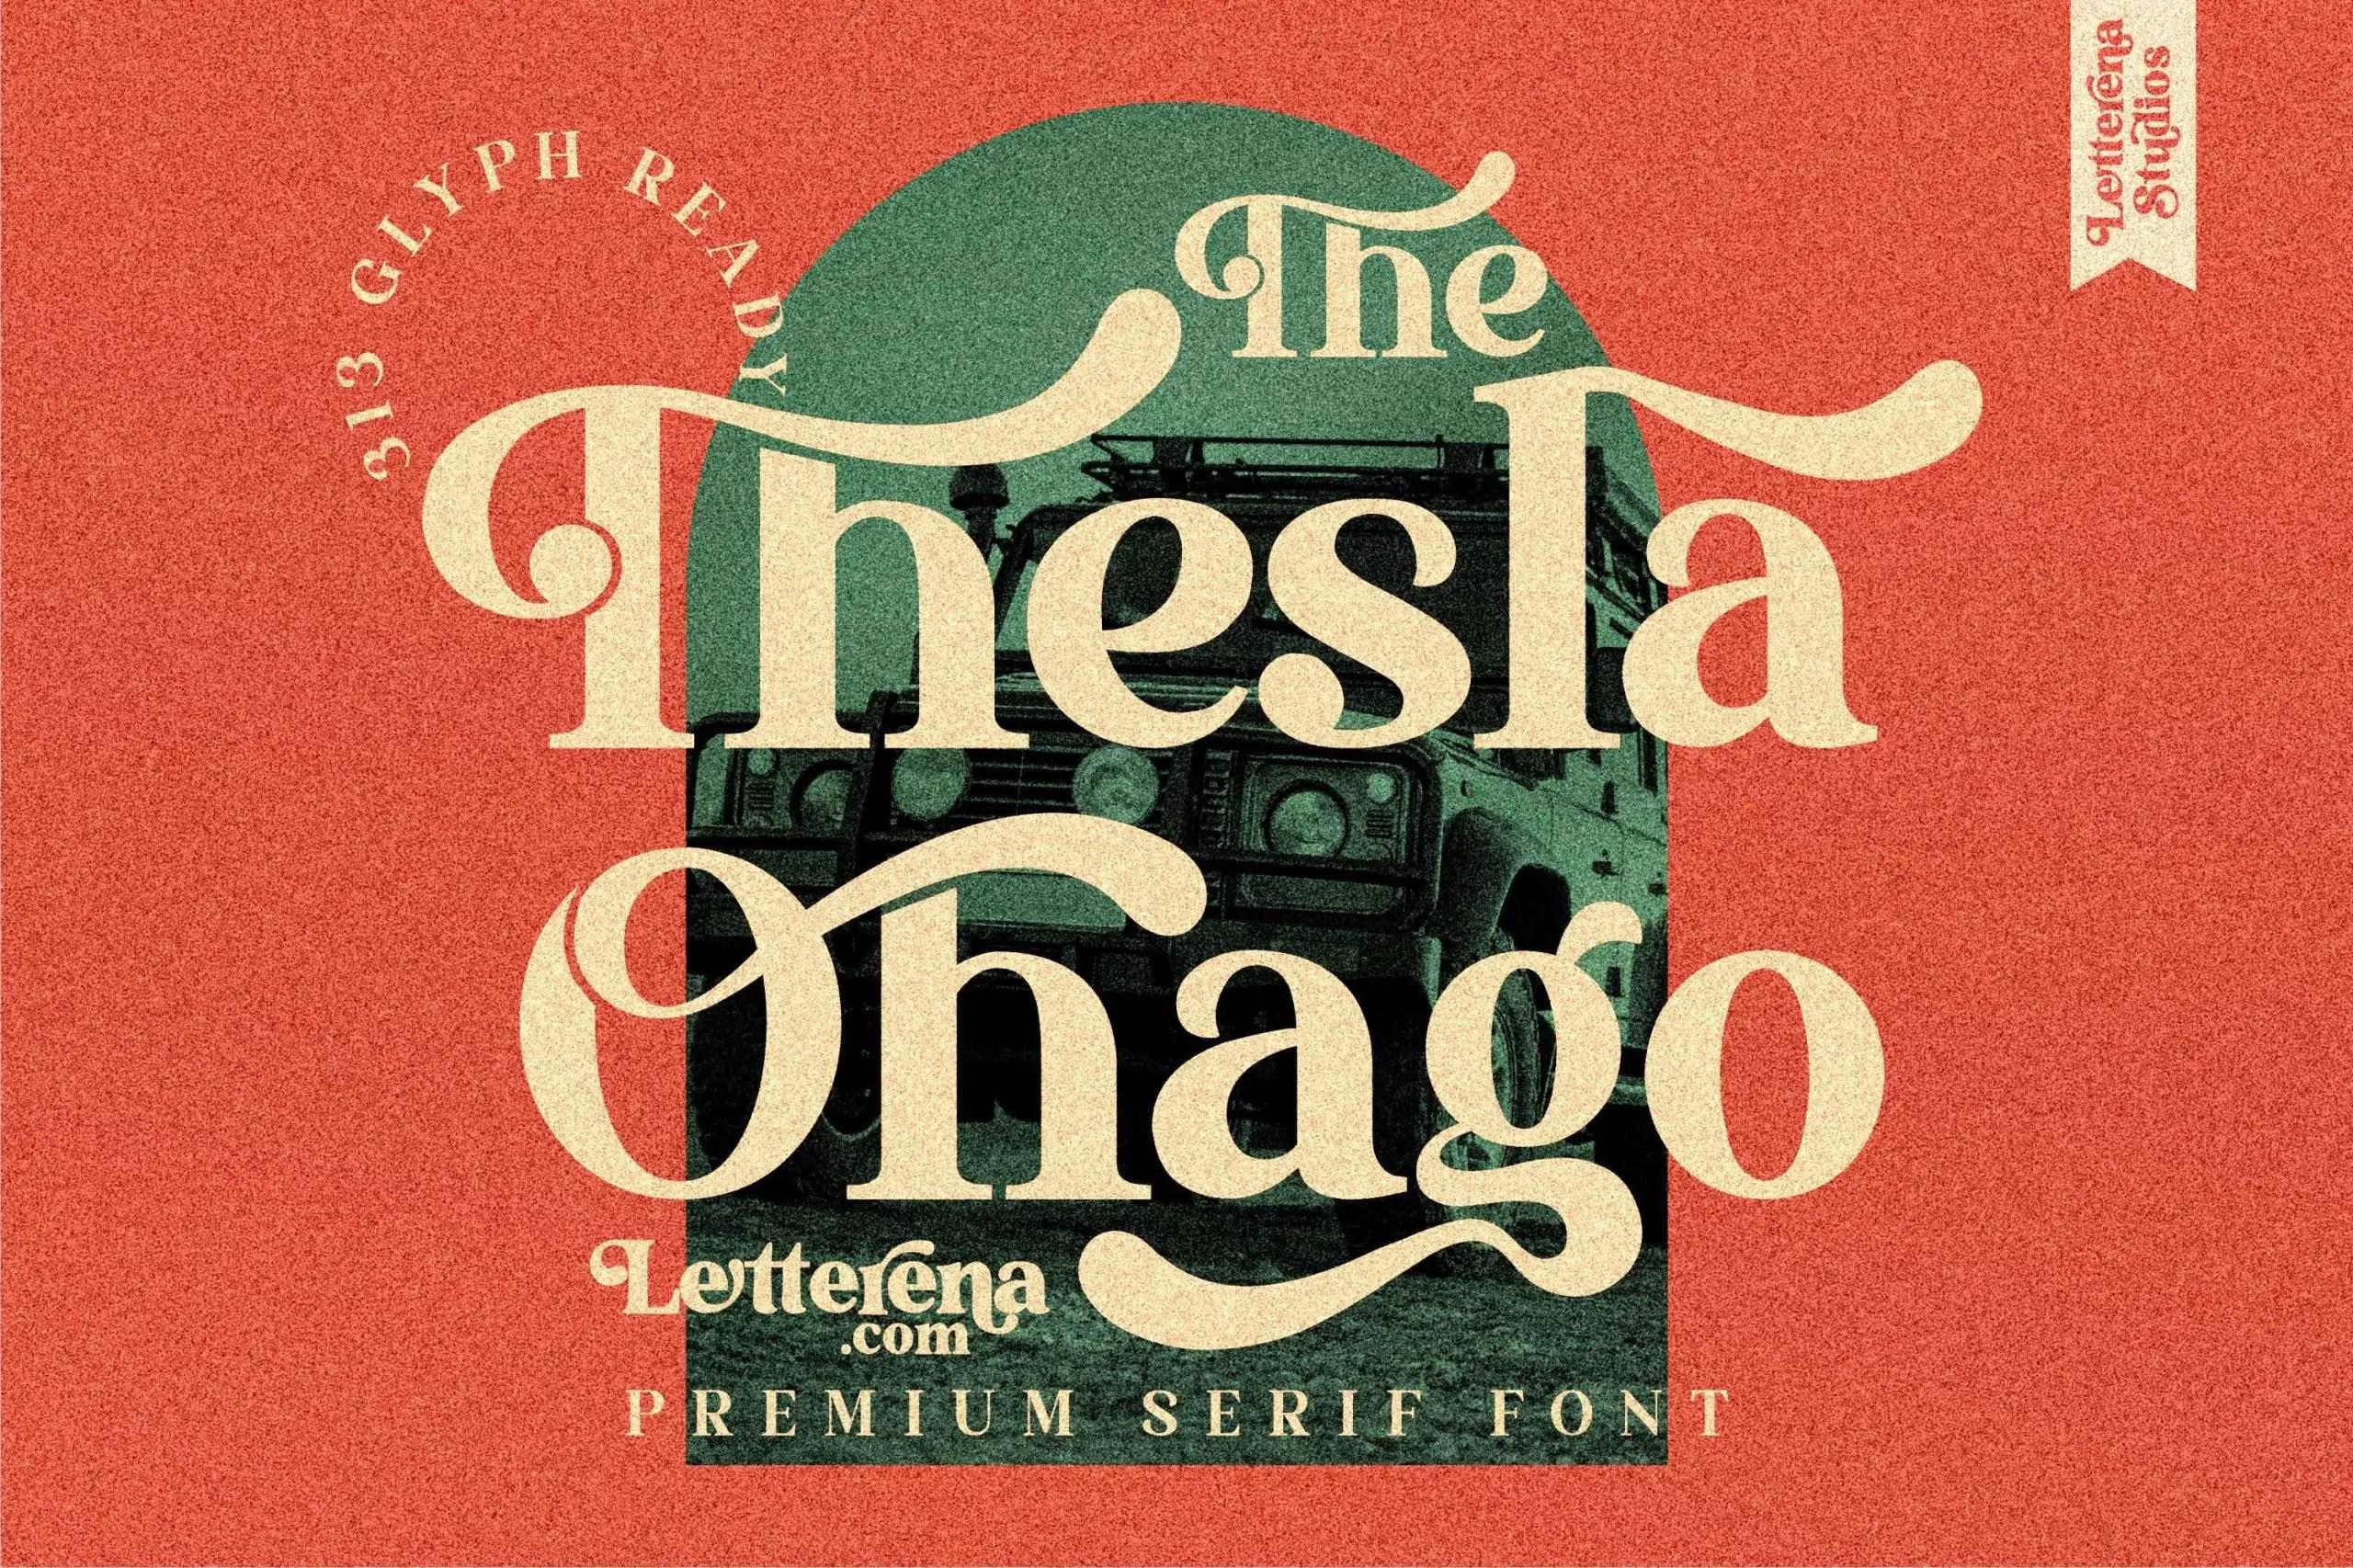 The Thesla Ohago Luxury Serif Font -1